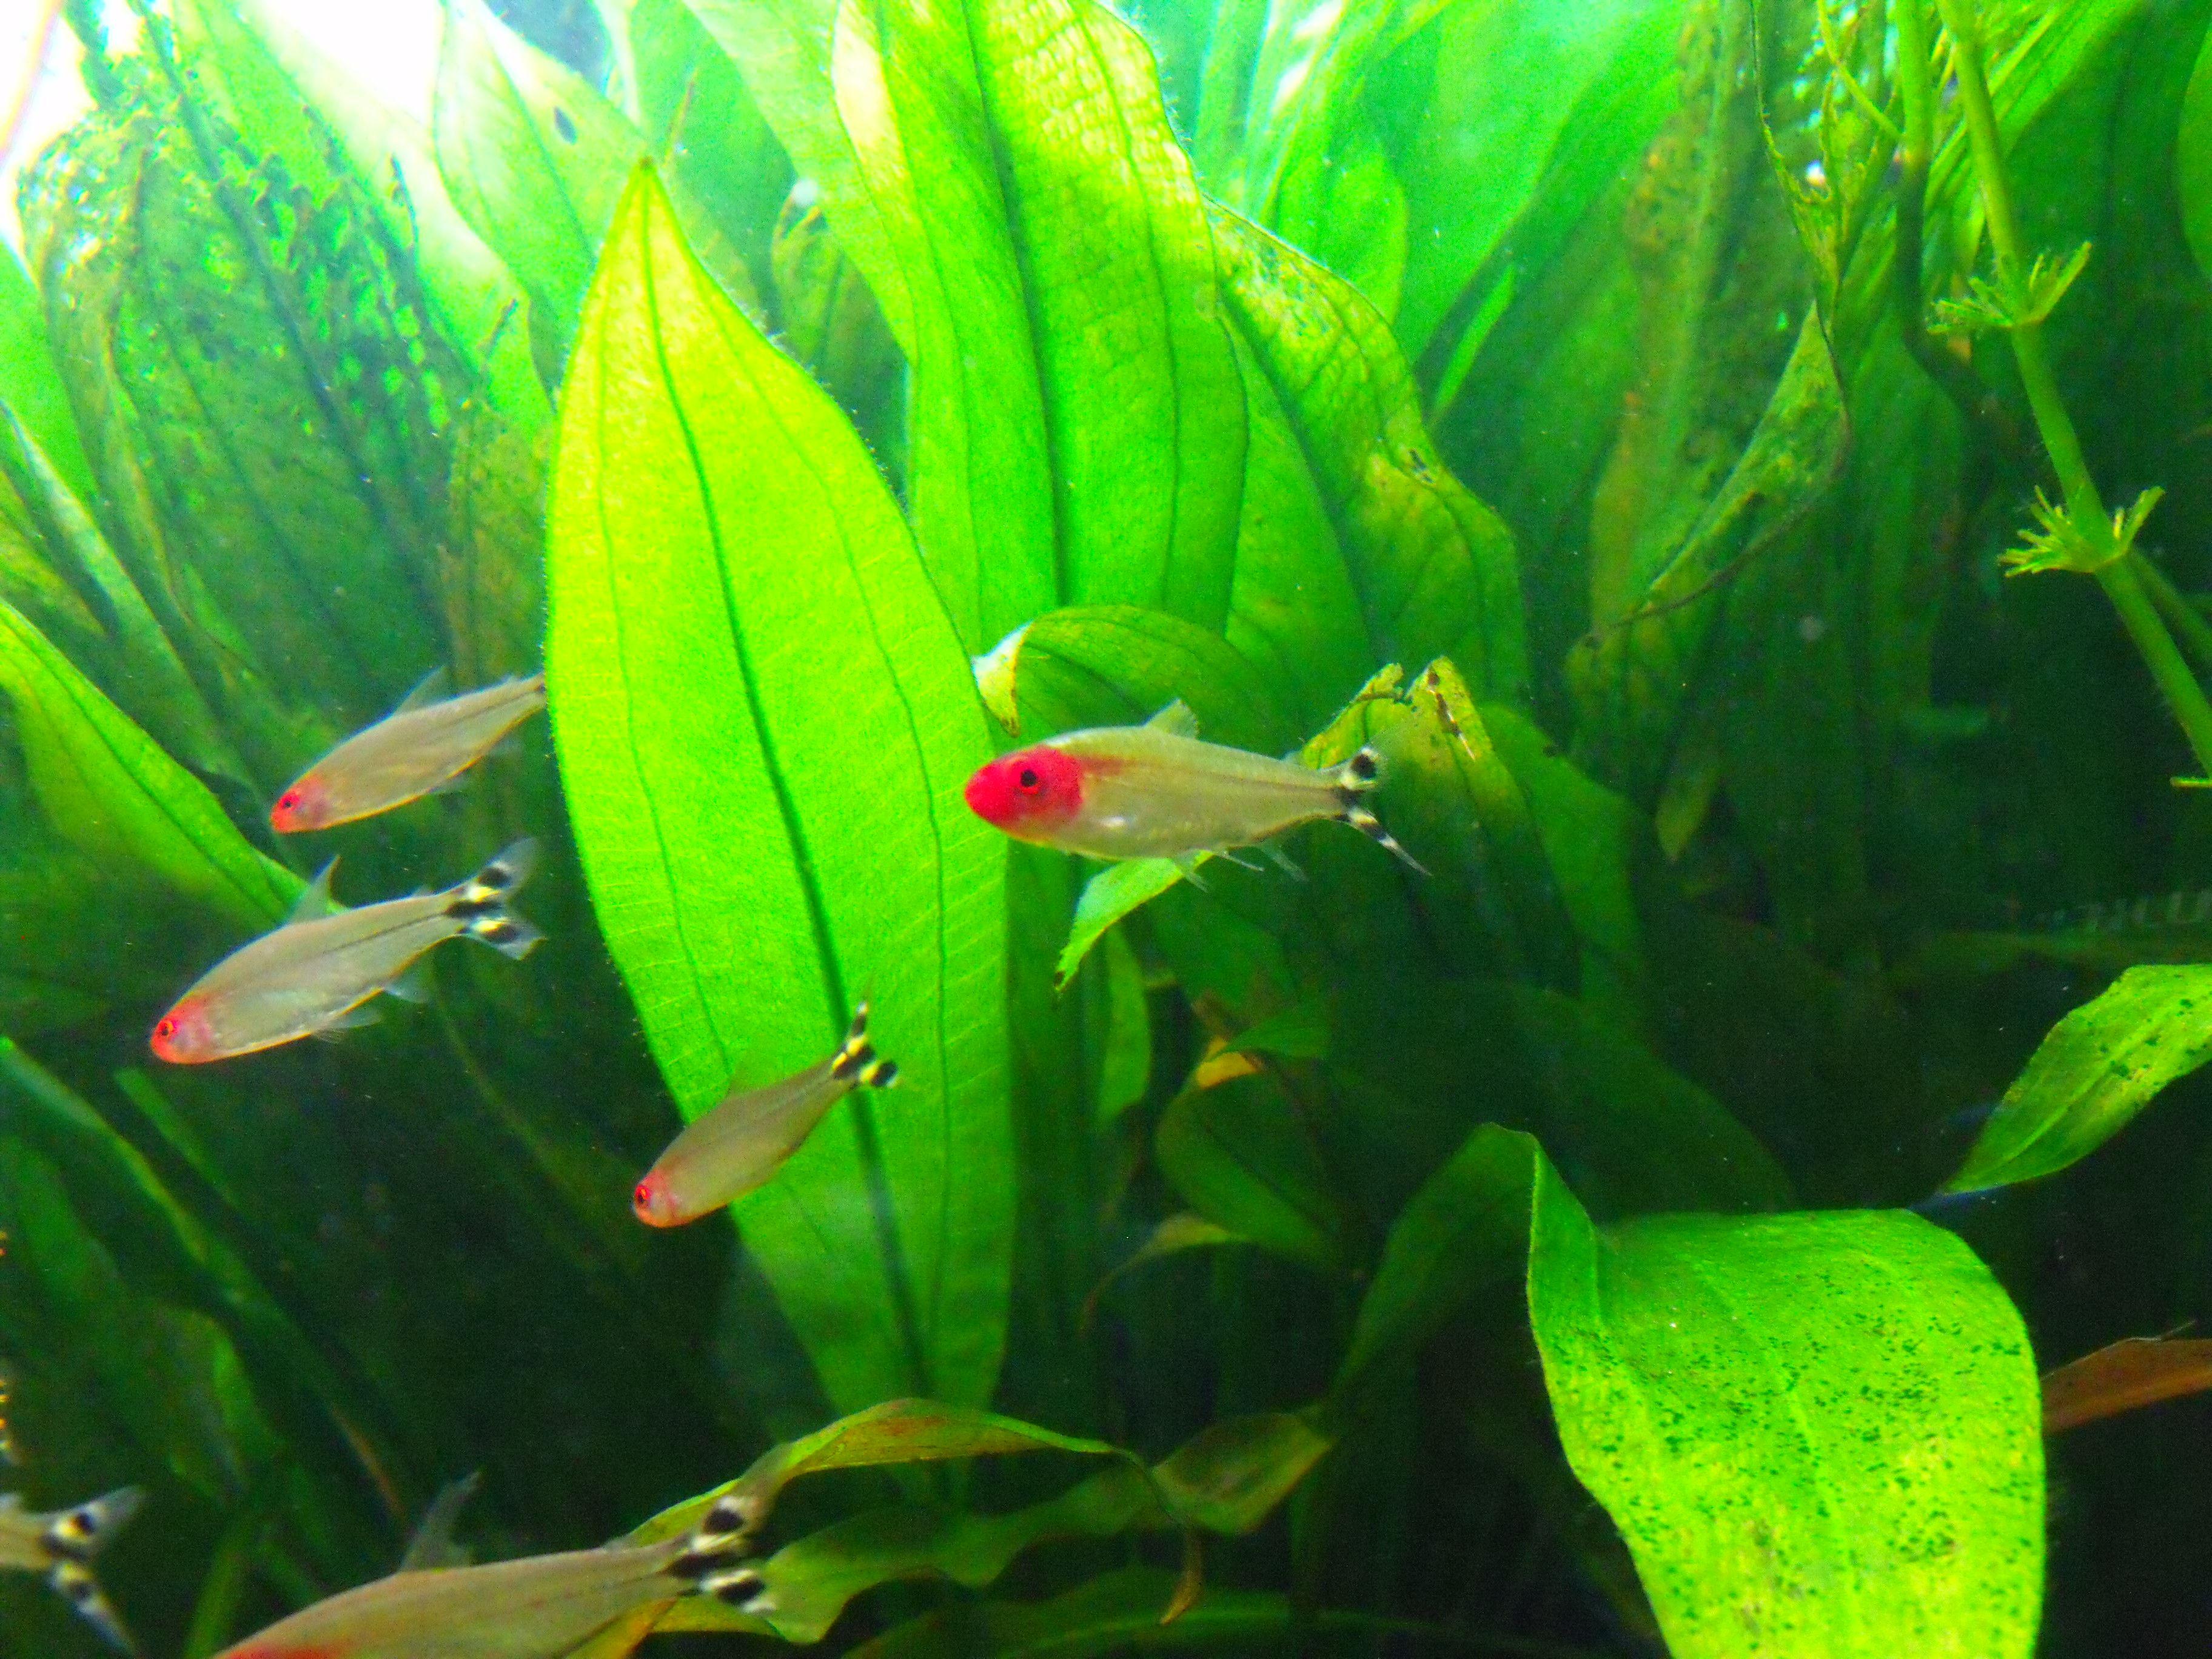 The Rummynose Tetra Hemigrammus Rhodostomus Tropical Freshwater Fish Aquarium Fish Ocean Fishing